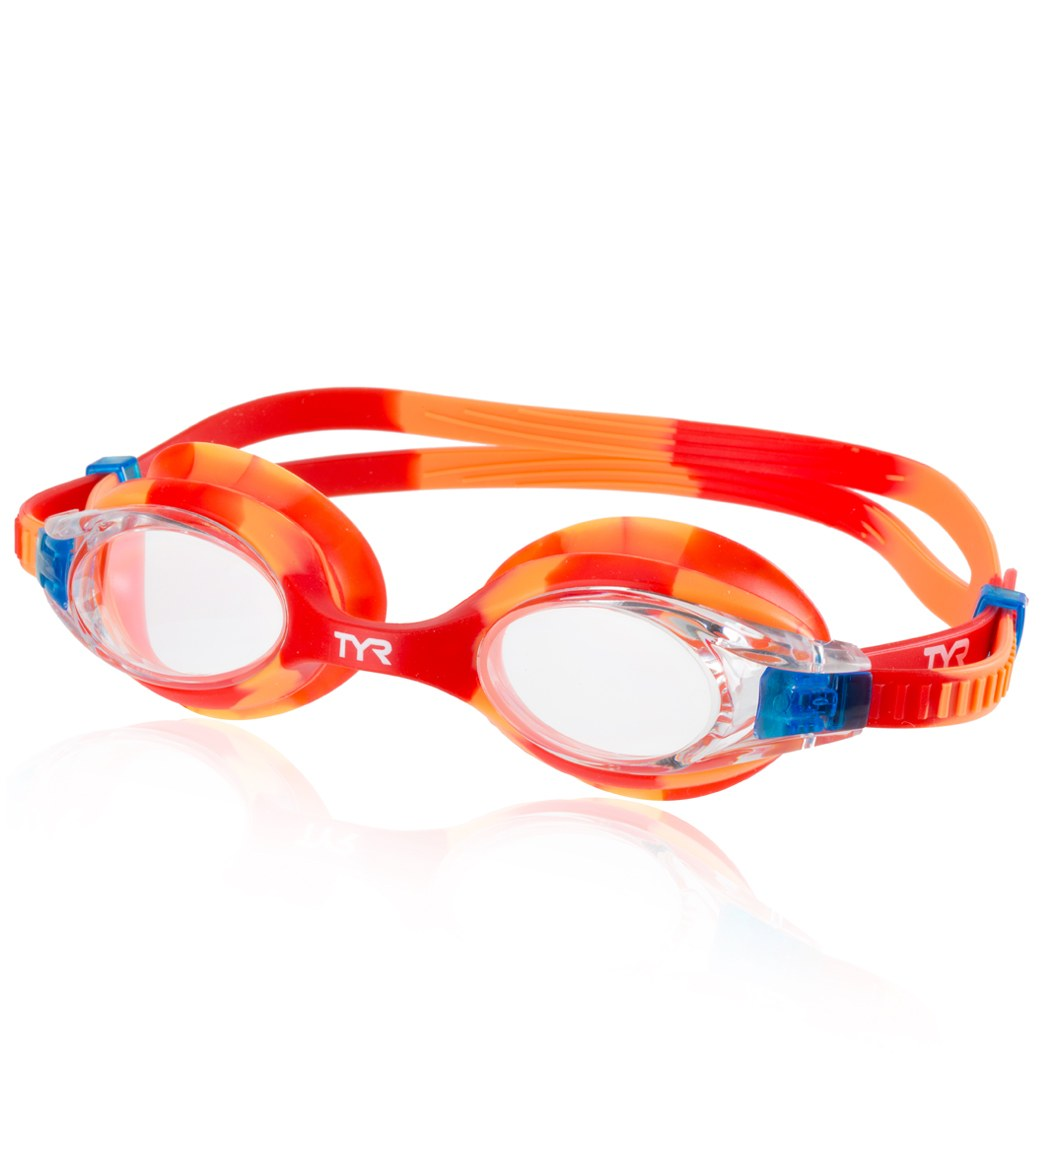 6fe1536fe89 TYR Big Swimple Tie Dye Swim Goggle at SwimOutlet.com